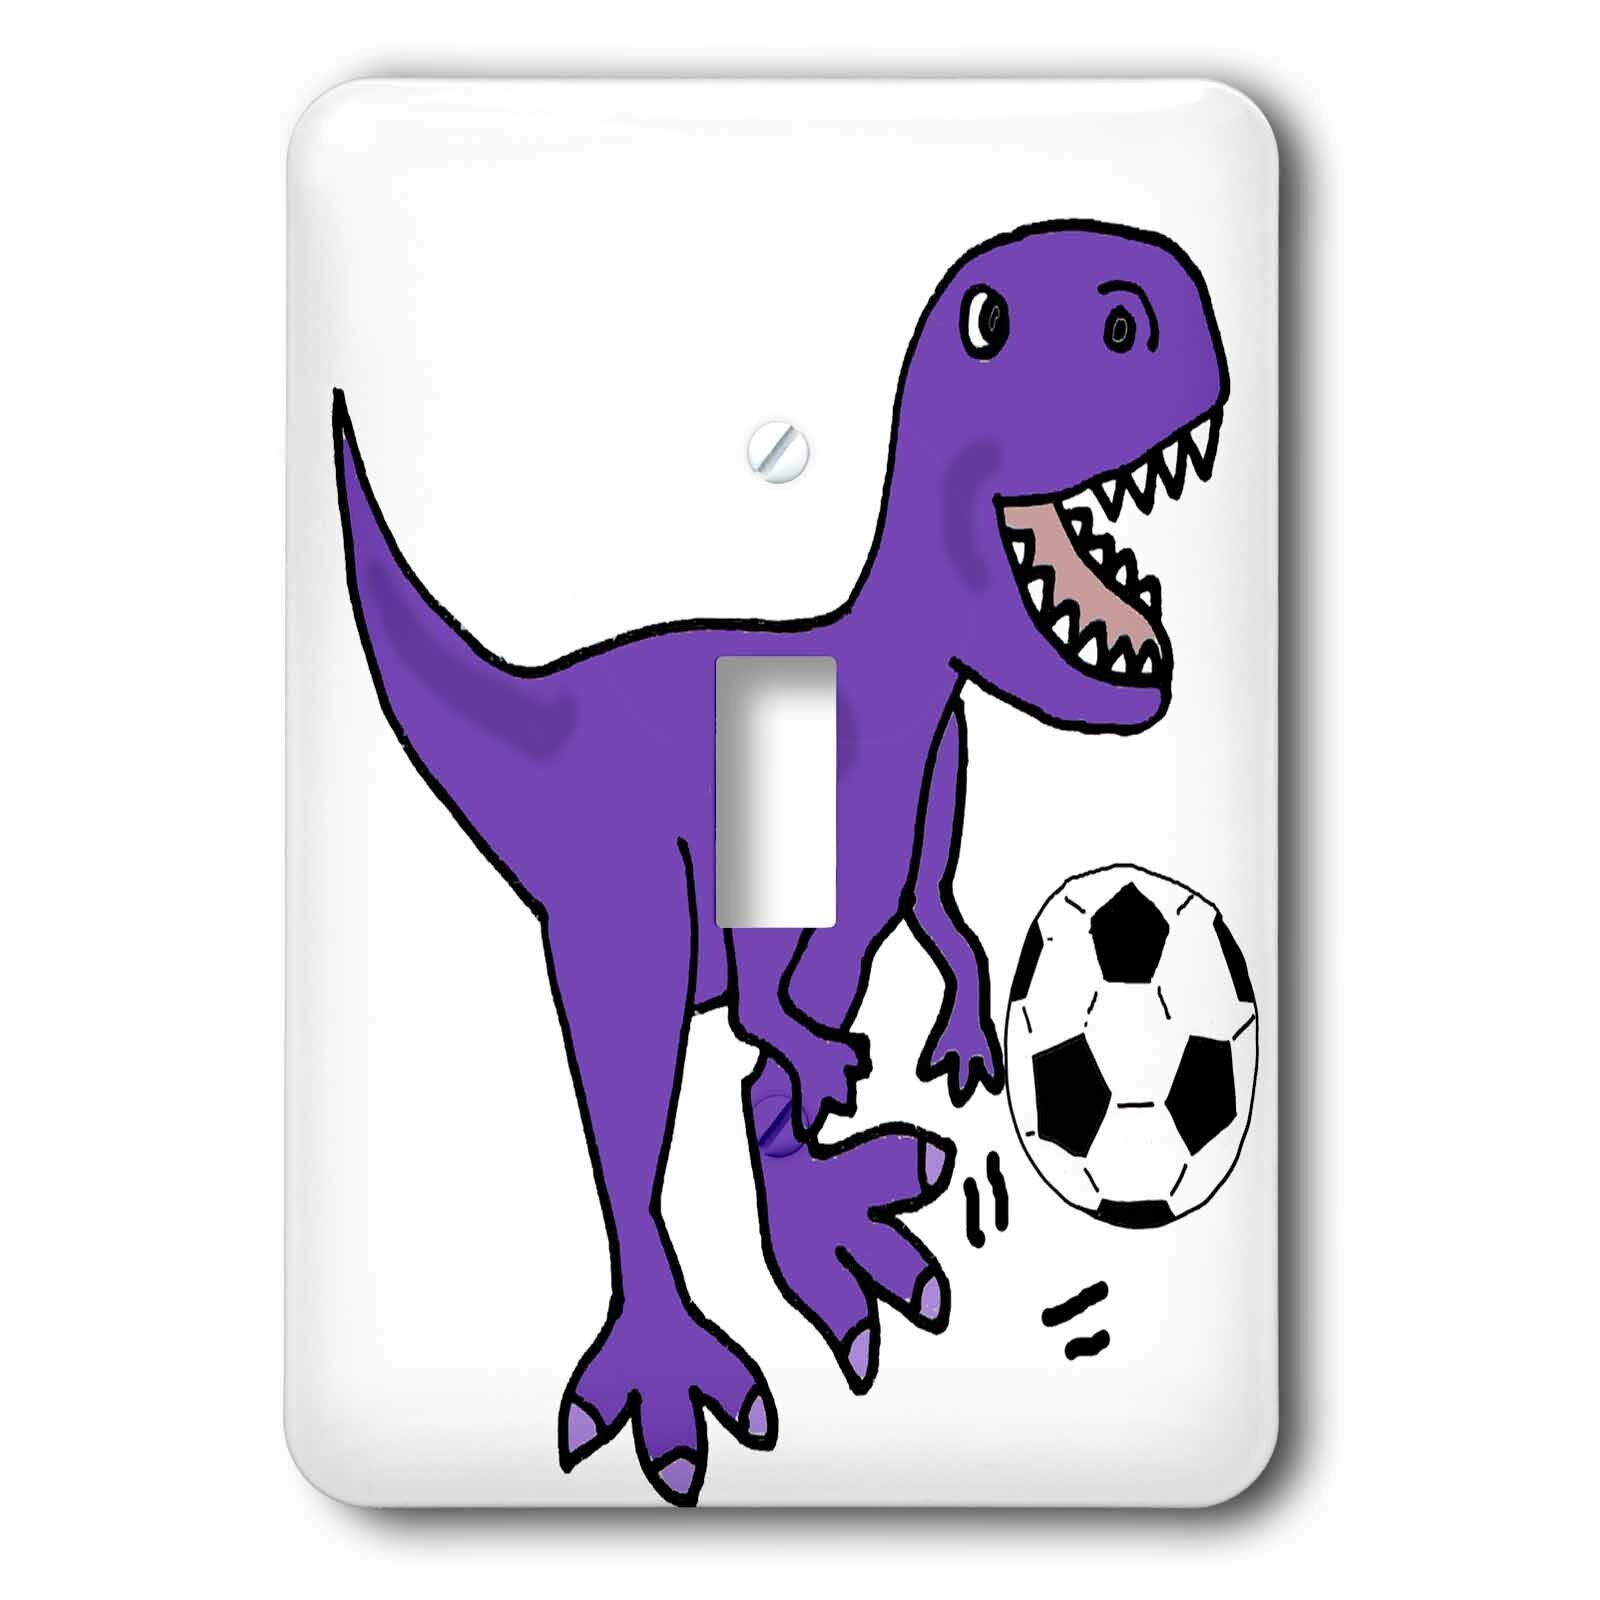 3drose Cute T Rex Dinosaur Playing Soccer 1 Gang Toggle Light Switch Wall Plate Wayfair